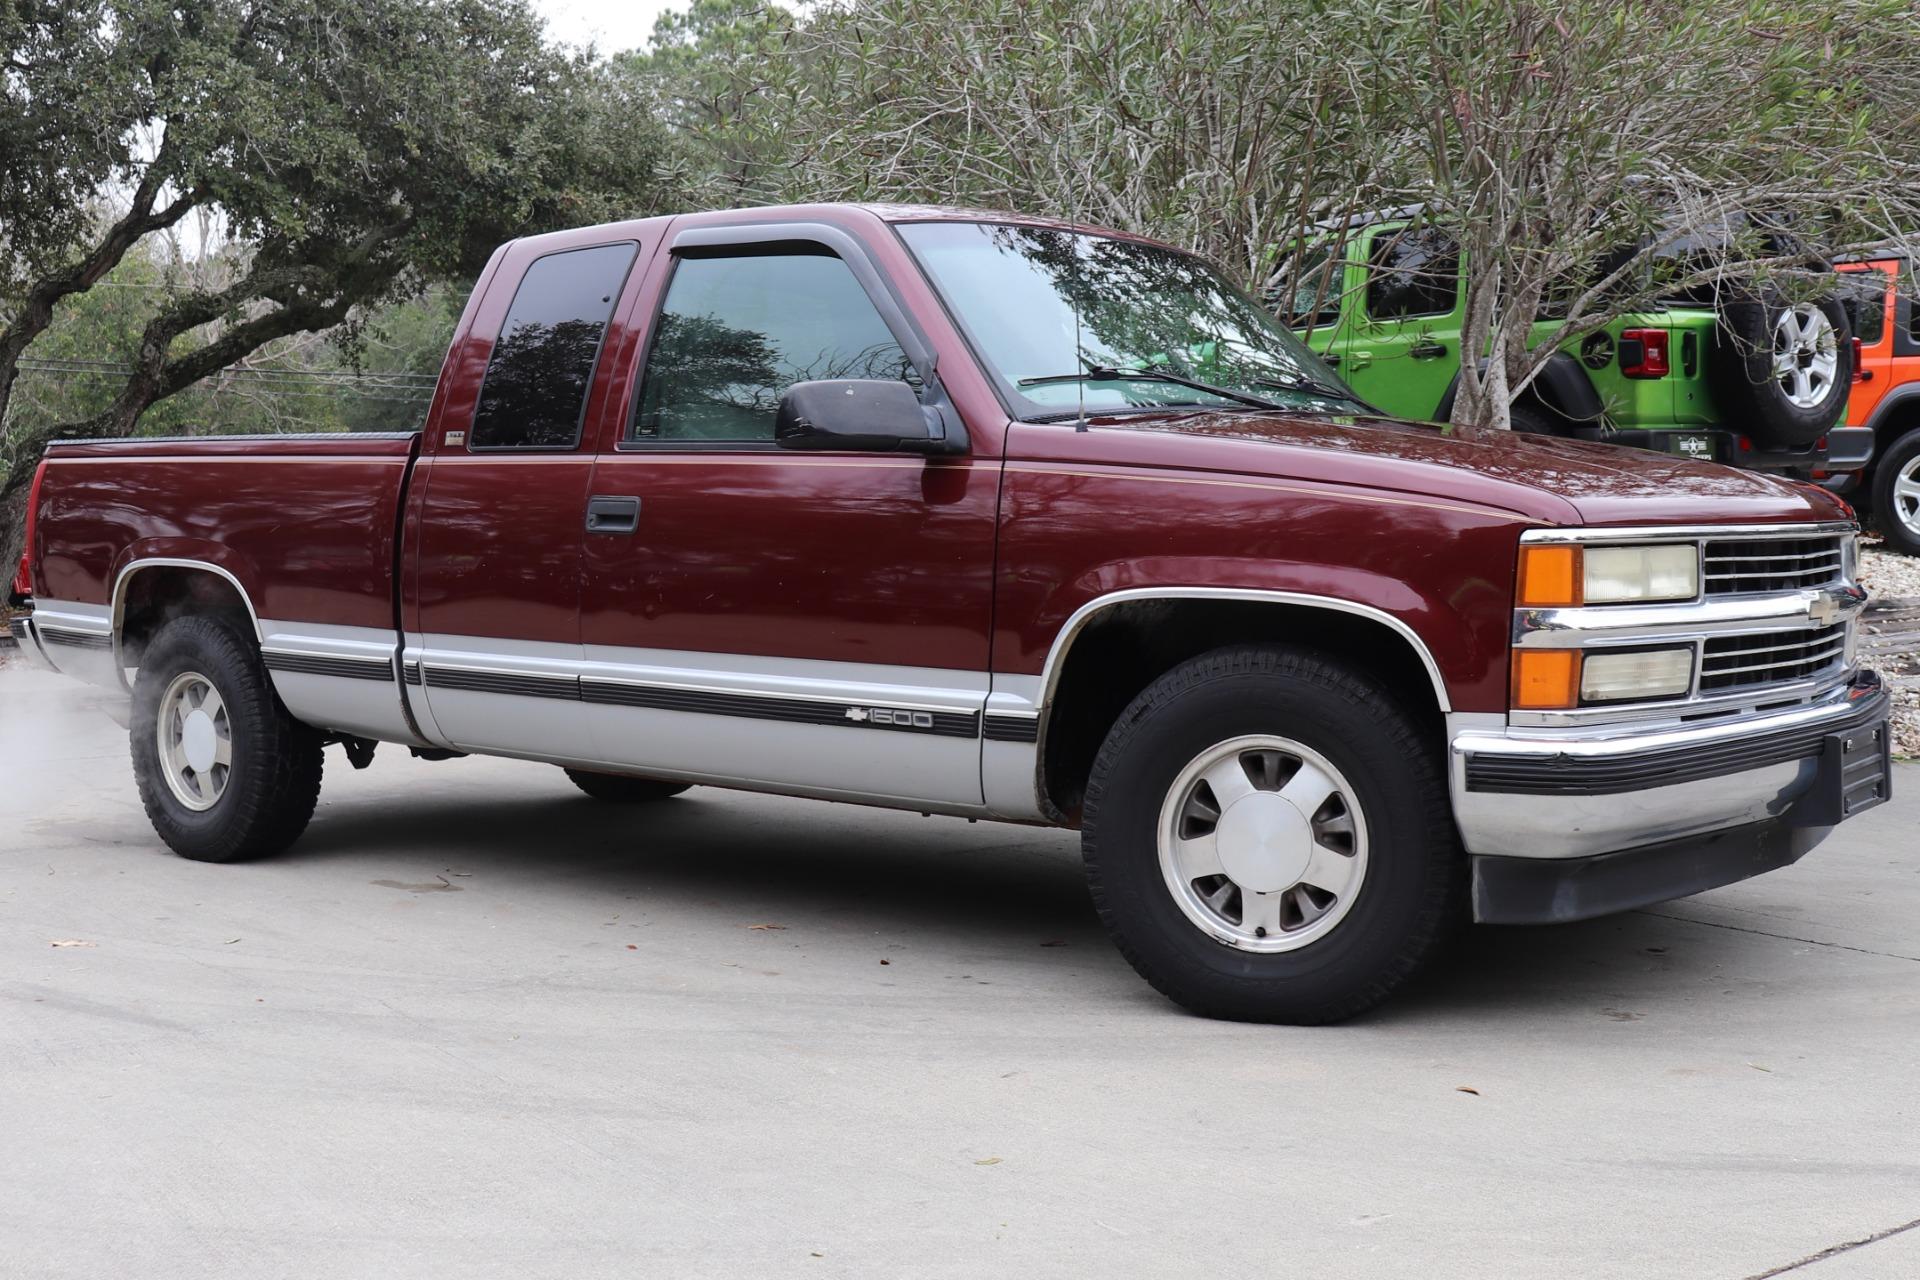 Used-1997-Chevrolet-C/K-1500-Series-C1500-Silverado